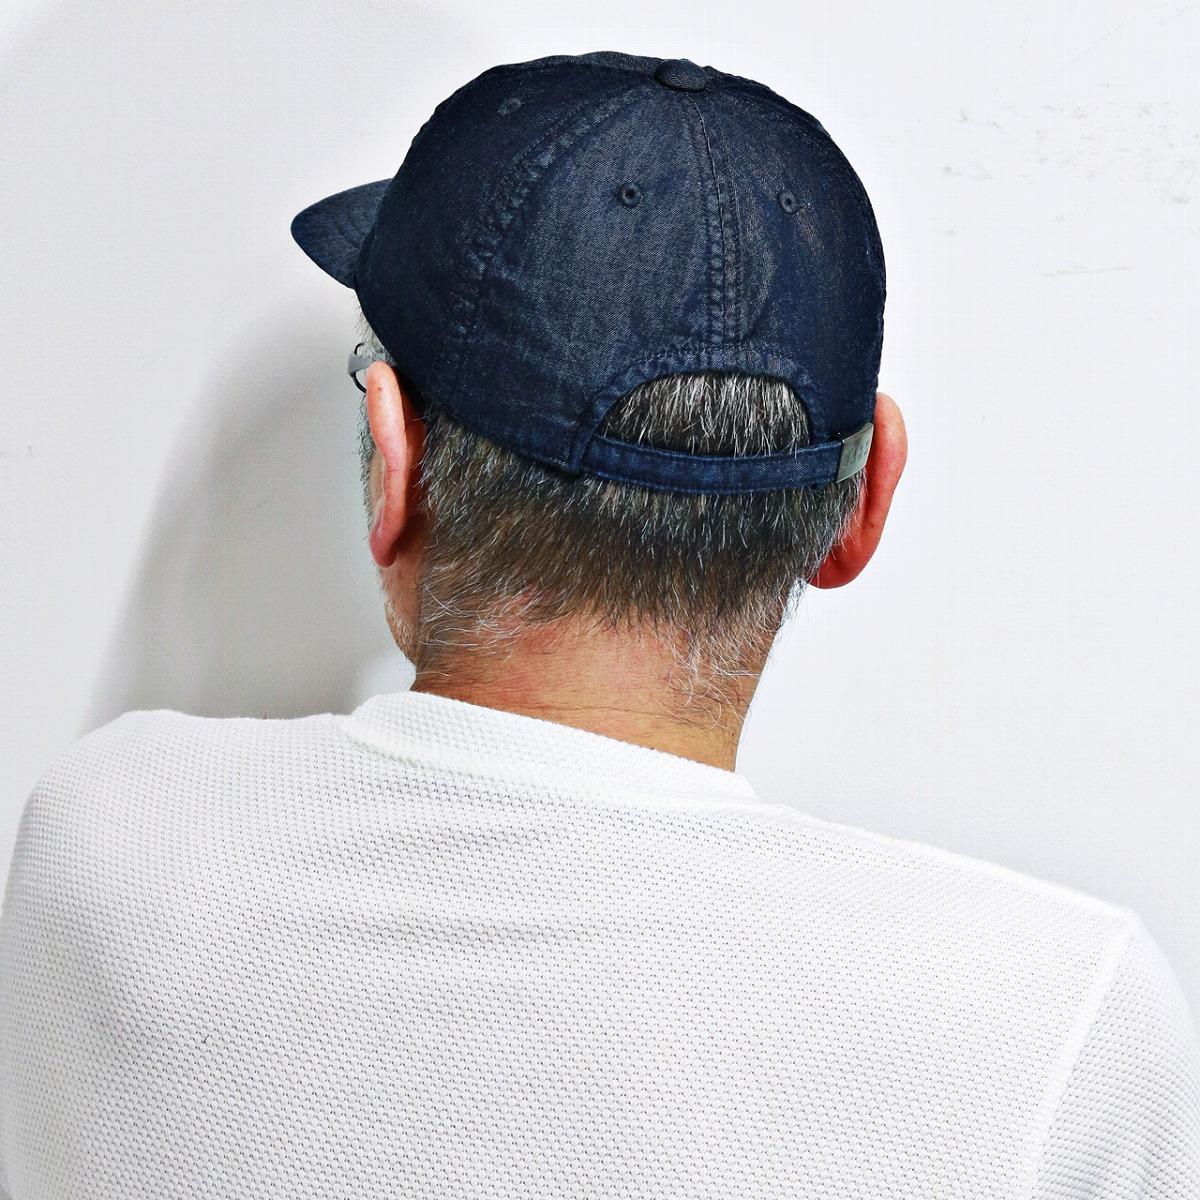 DAKS Cap mens denim baseball cap ducks baseball hat men Cap GIZA 92 luxury  cotton daks fashion Hat fashion accessory long brim adjustable Japan-Navy  Navy ... 454bf48c287